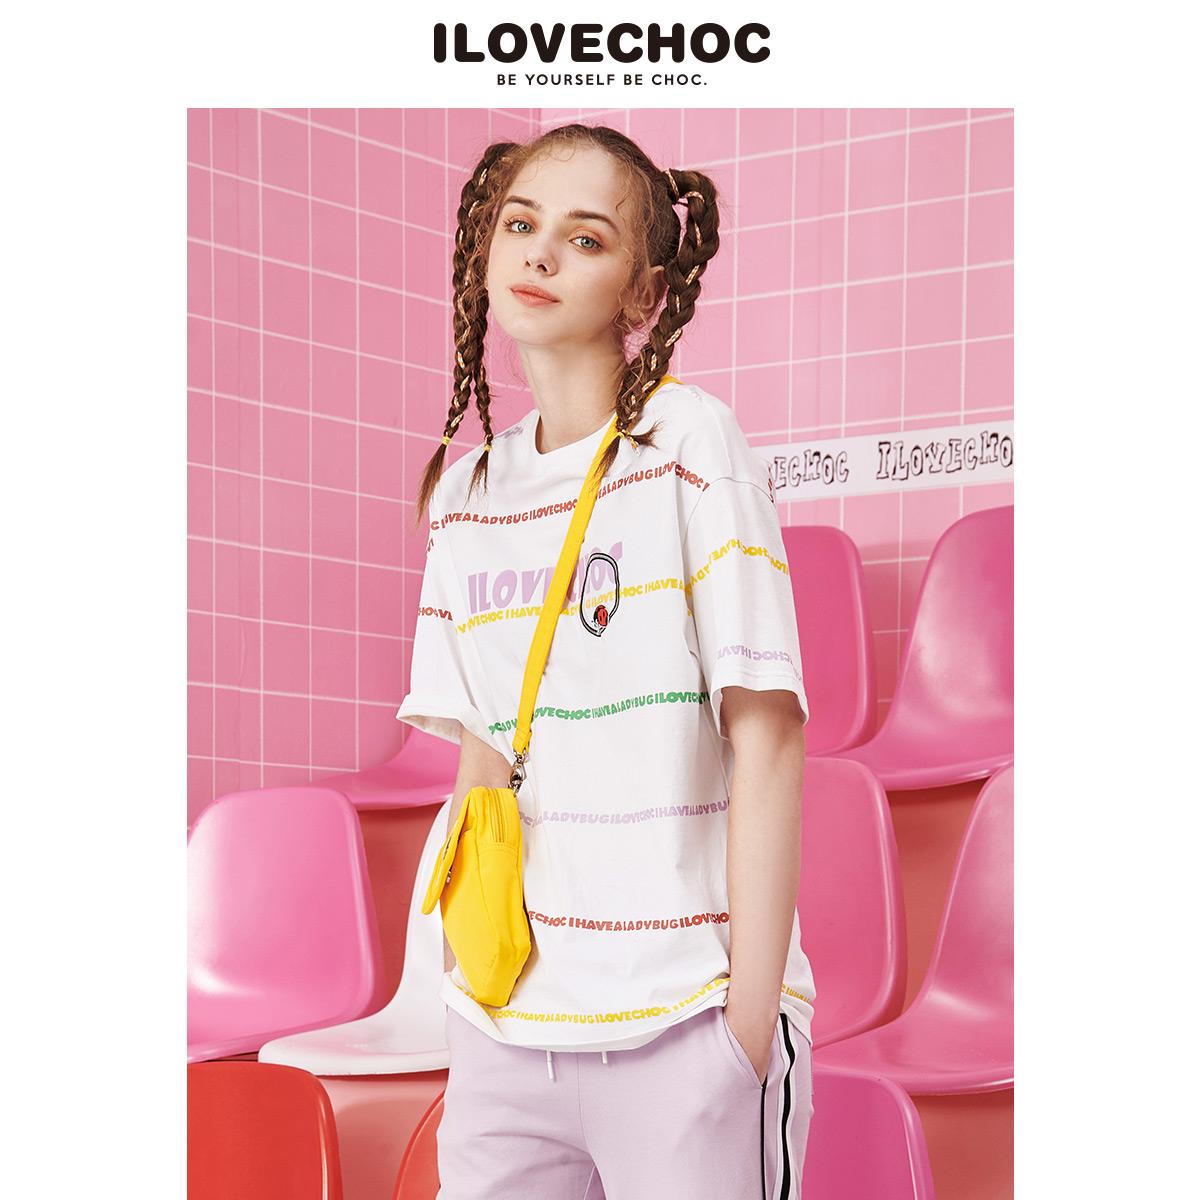 ILOVECHOC我爱巧克力2019夏新款彩虹个性撞色气质潮条纹短袖T恤女限3000张券